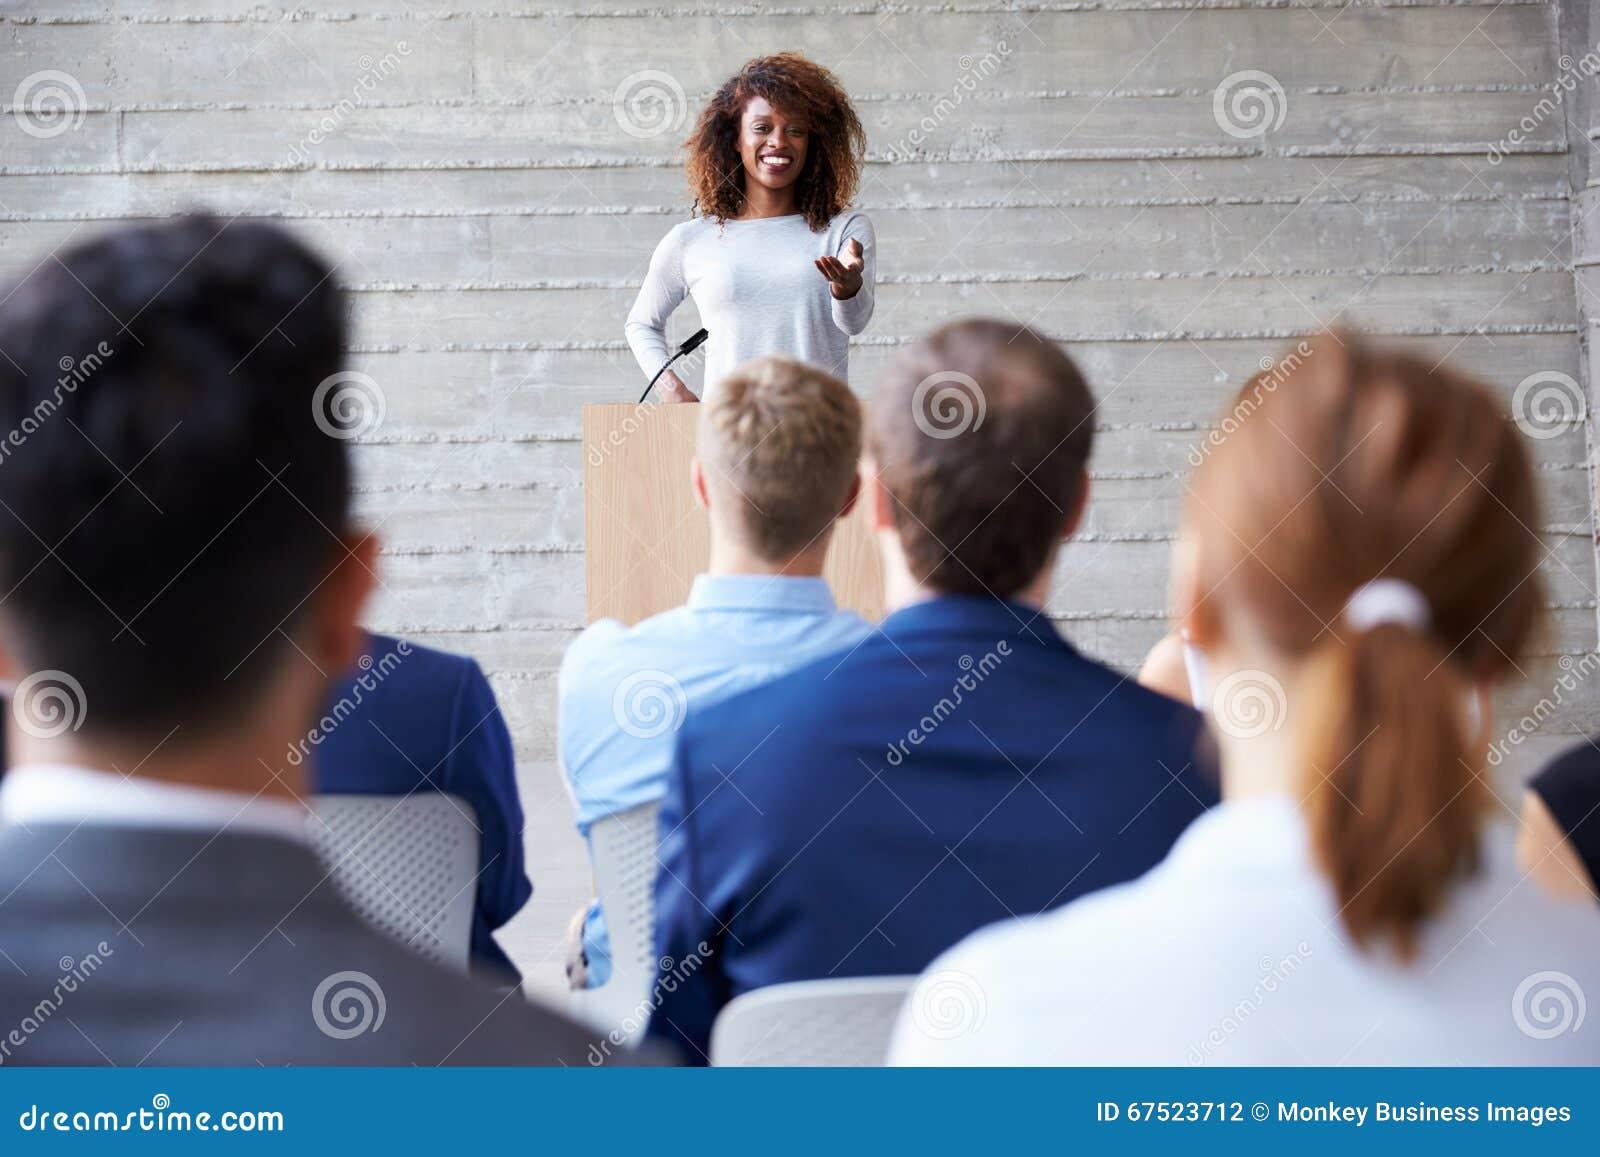 AffärskvinnaAddressing Delegates At konferens